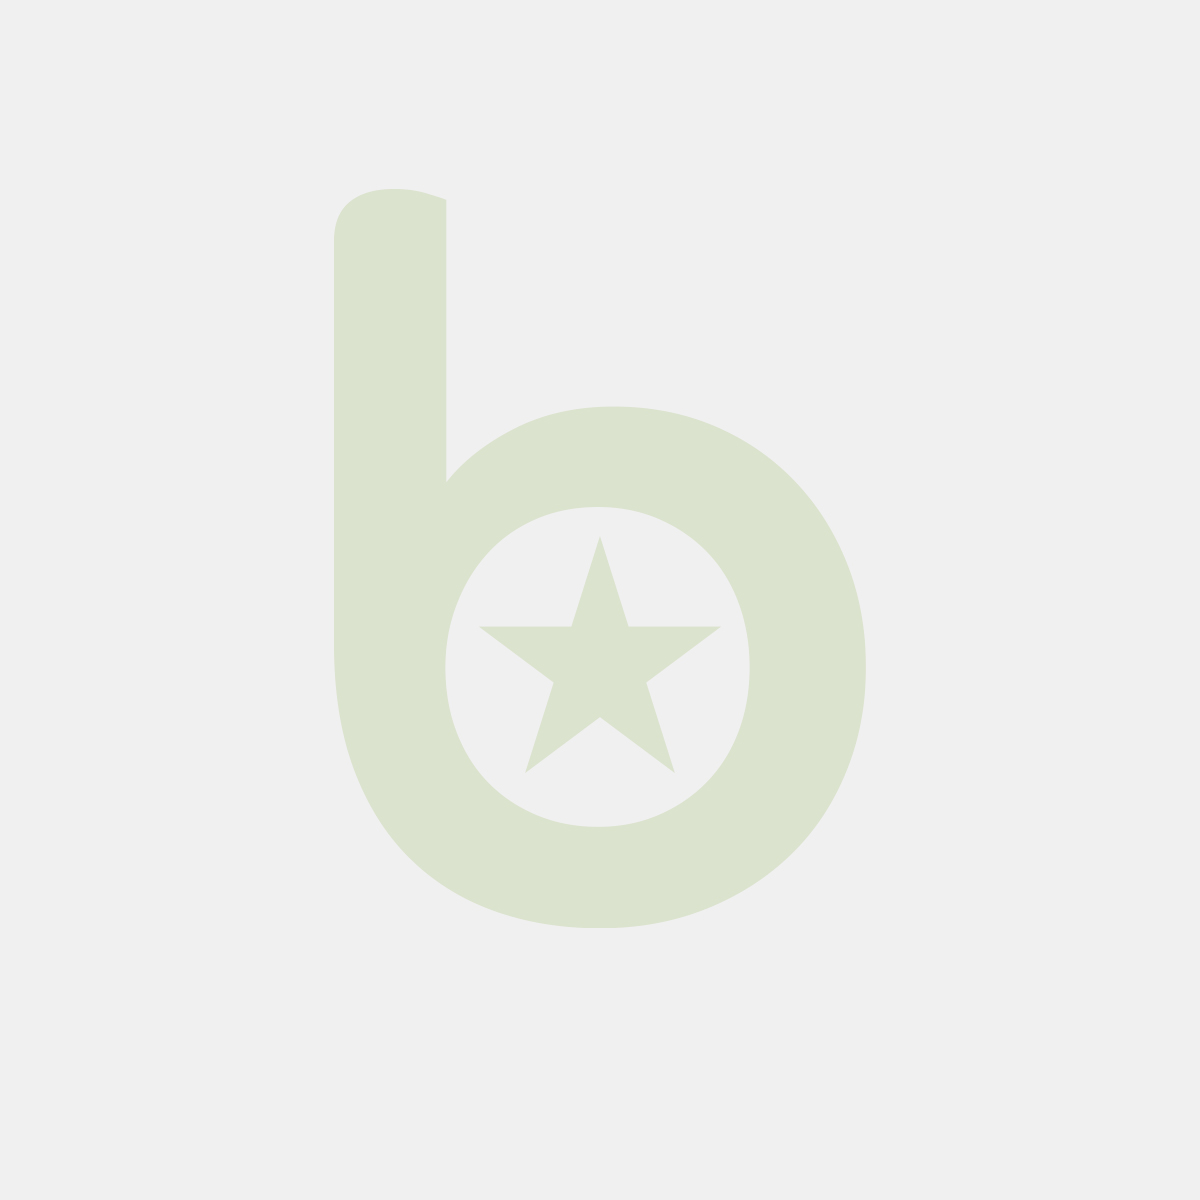 Schładzarka szokowa 3x GN 2/3